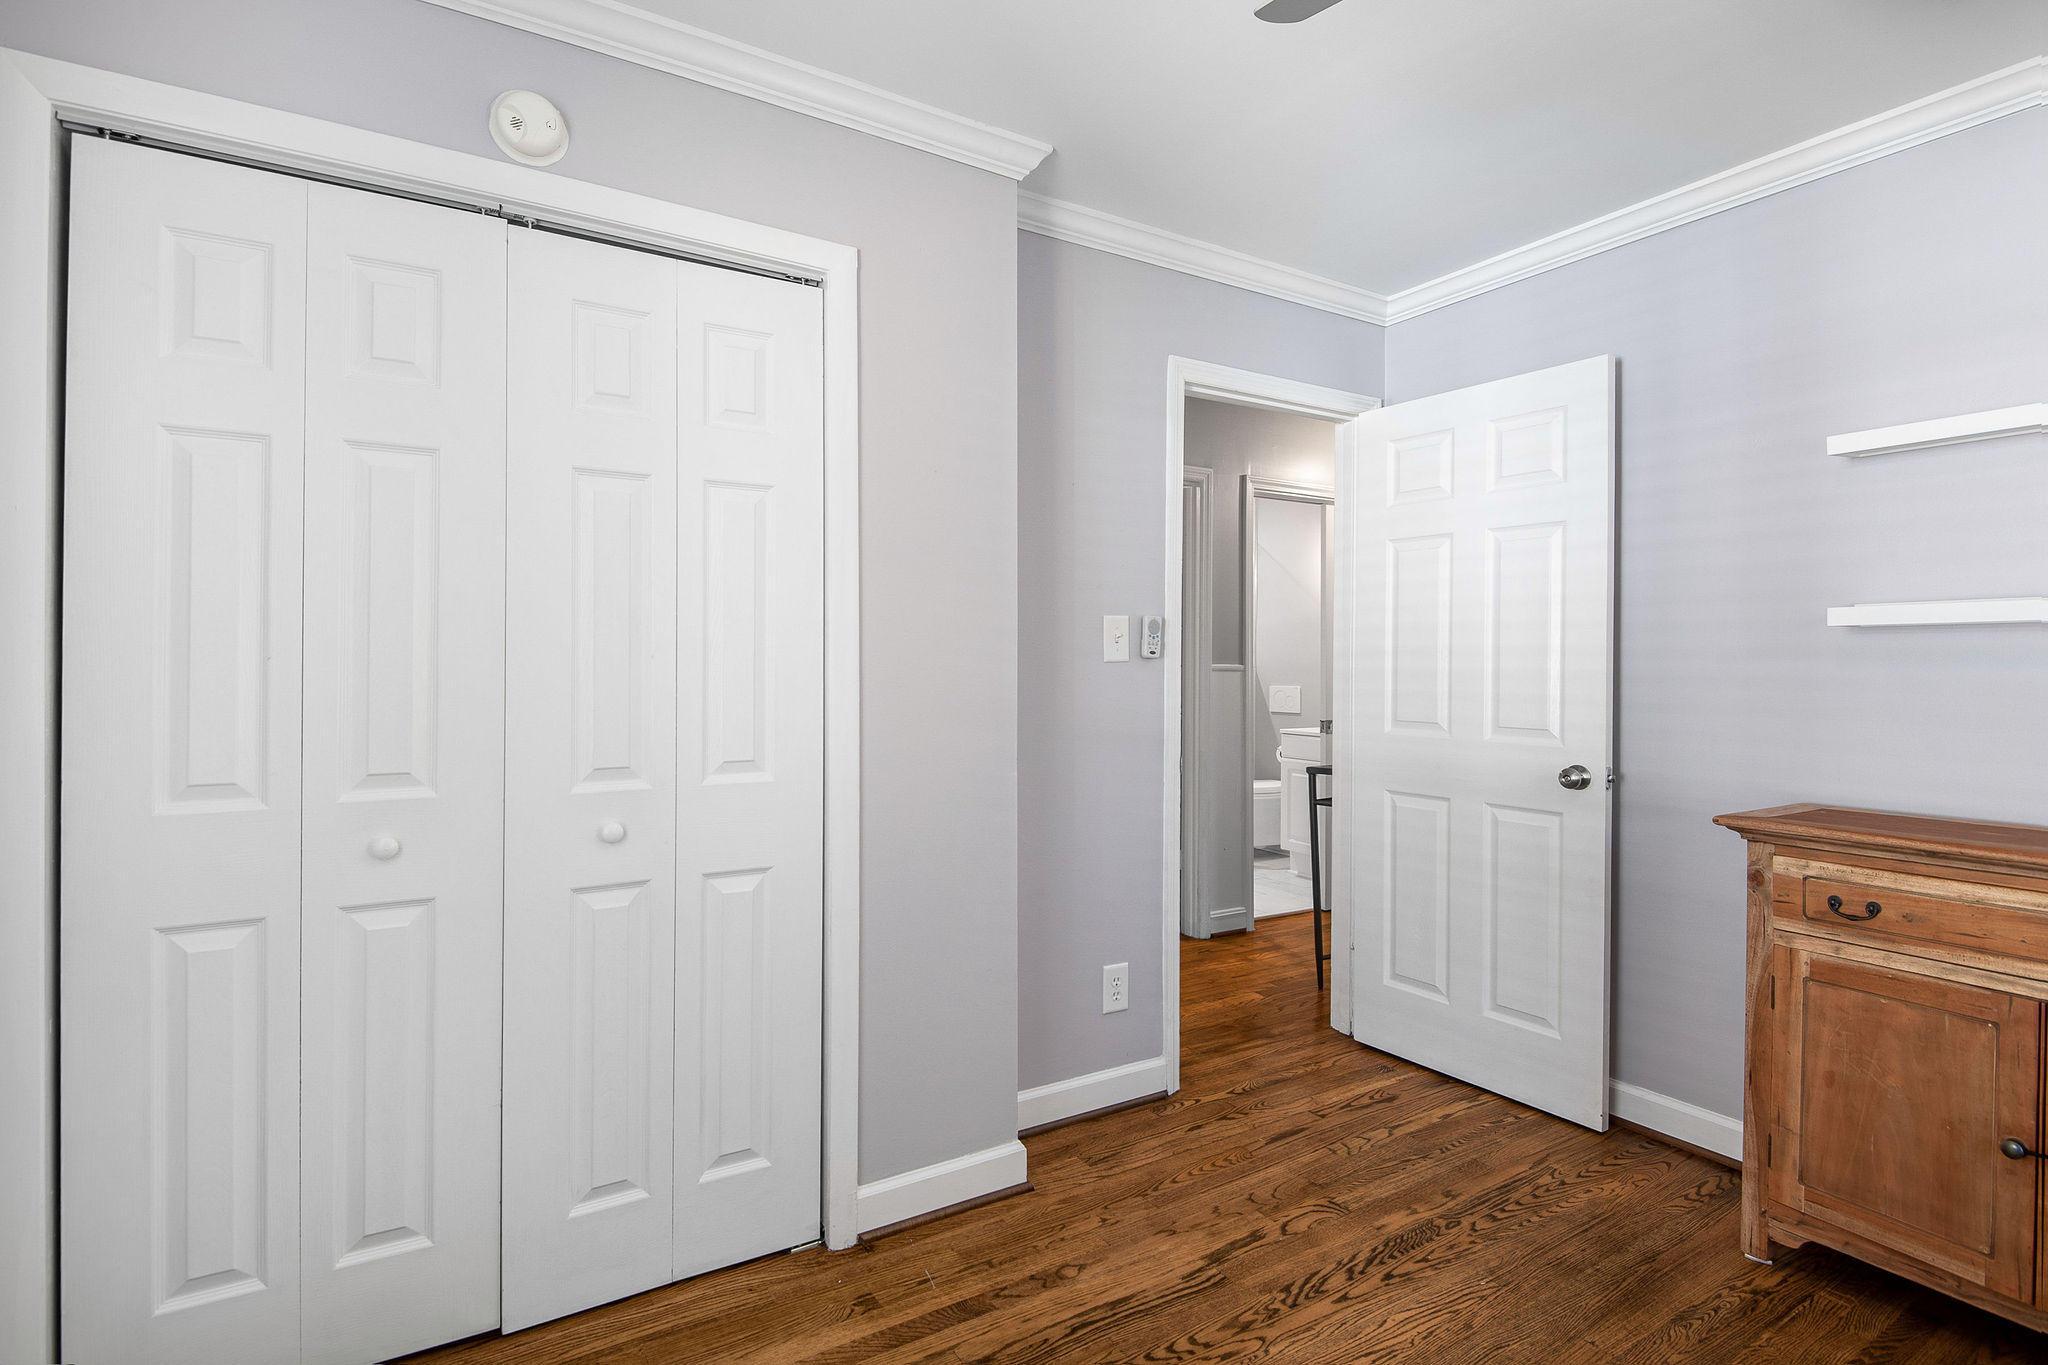 Old Mt Pleasant Homes For Sale - 914 Center, Mount Pleasant, SC - 41